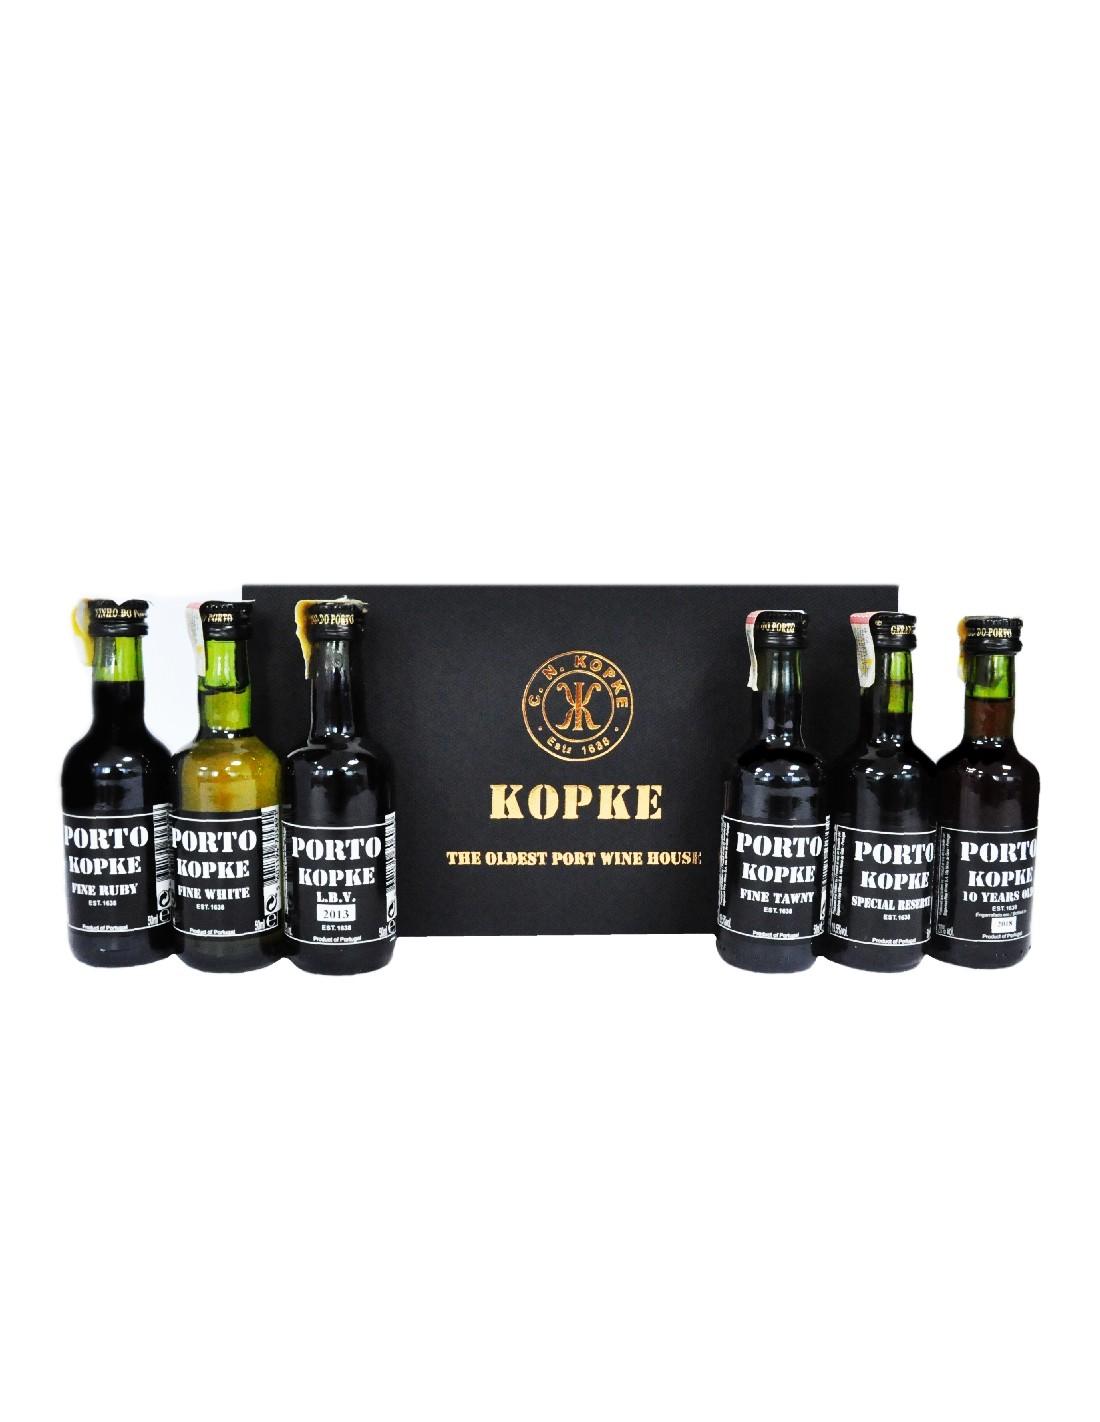 Vin porto Kopke, kit 6 miniaturi, 20% alc., 0.05L, Portugalia